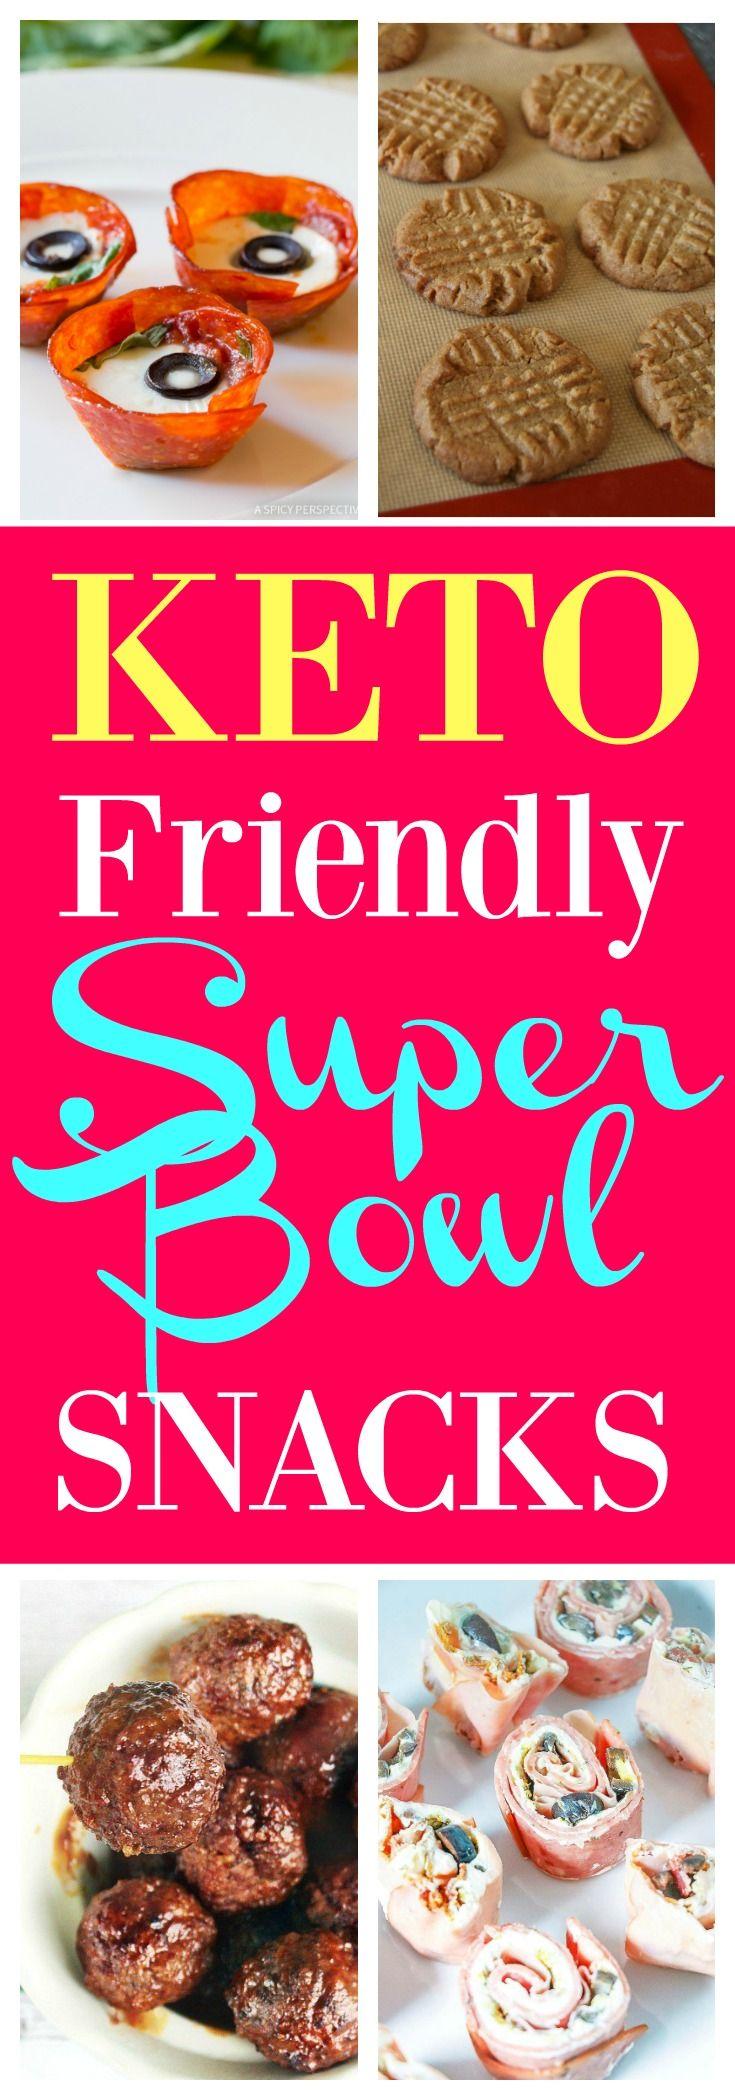 Keto Super Bowl Snacks – And a Keto Diet Update